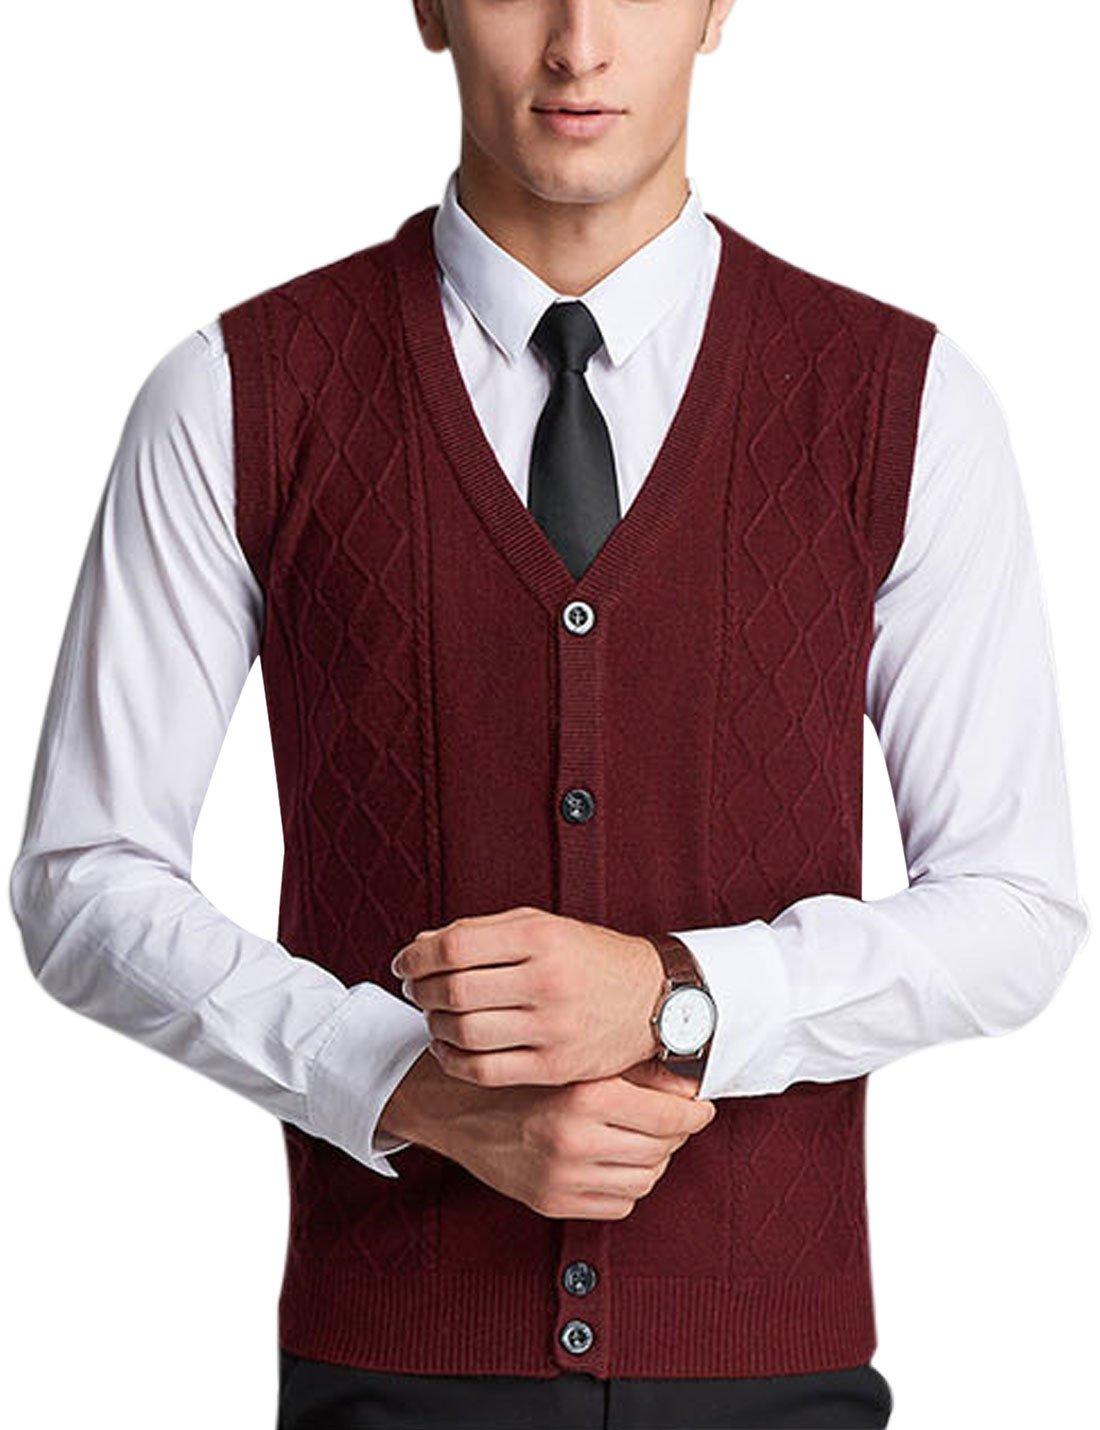 Yeokou Men's Wool V Neck Sleeveless Knitted Button Down Sweater Vest Waistcoat